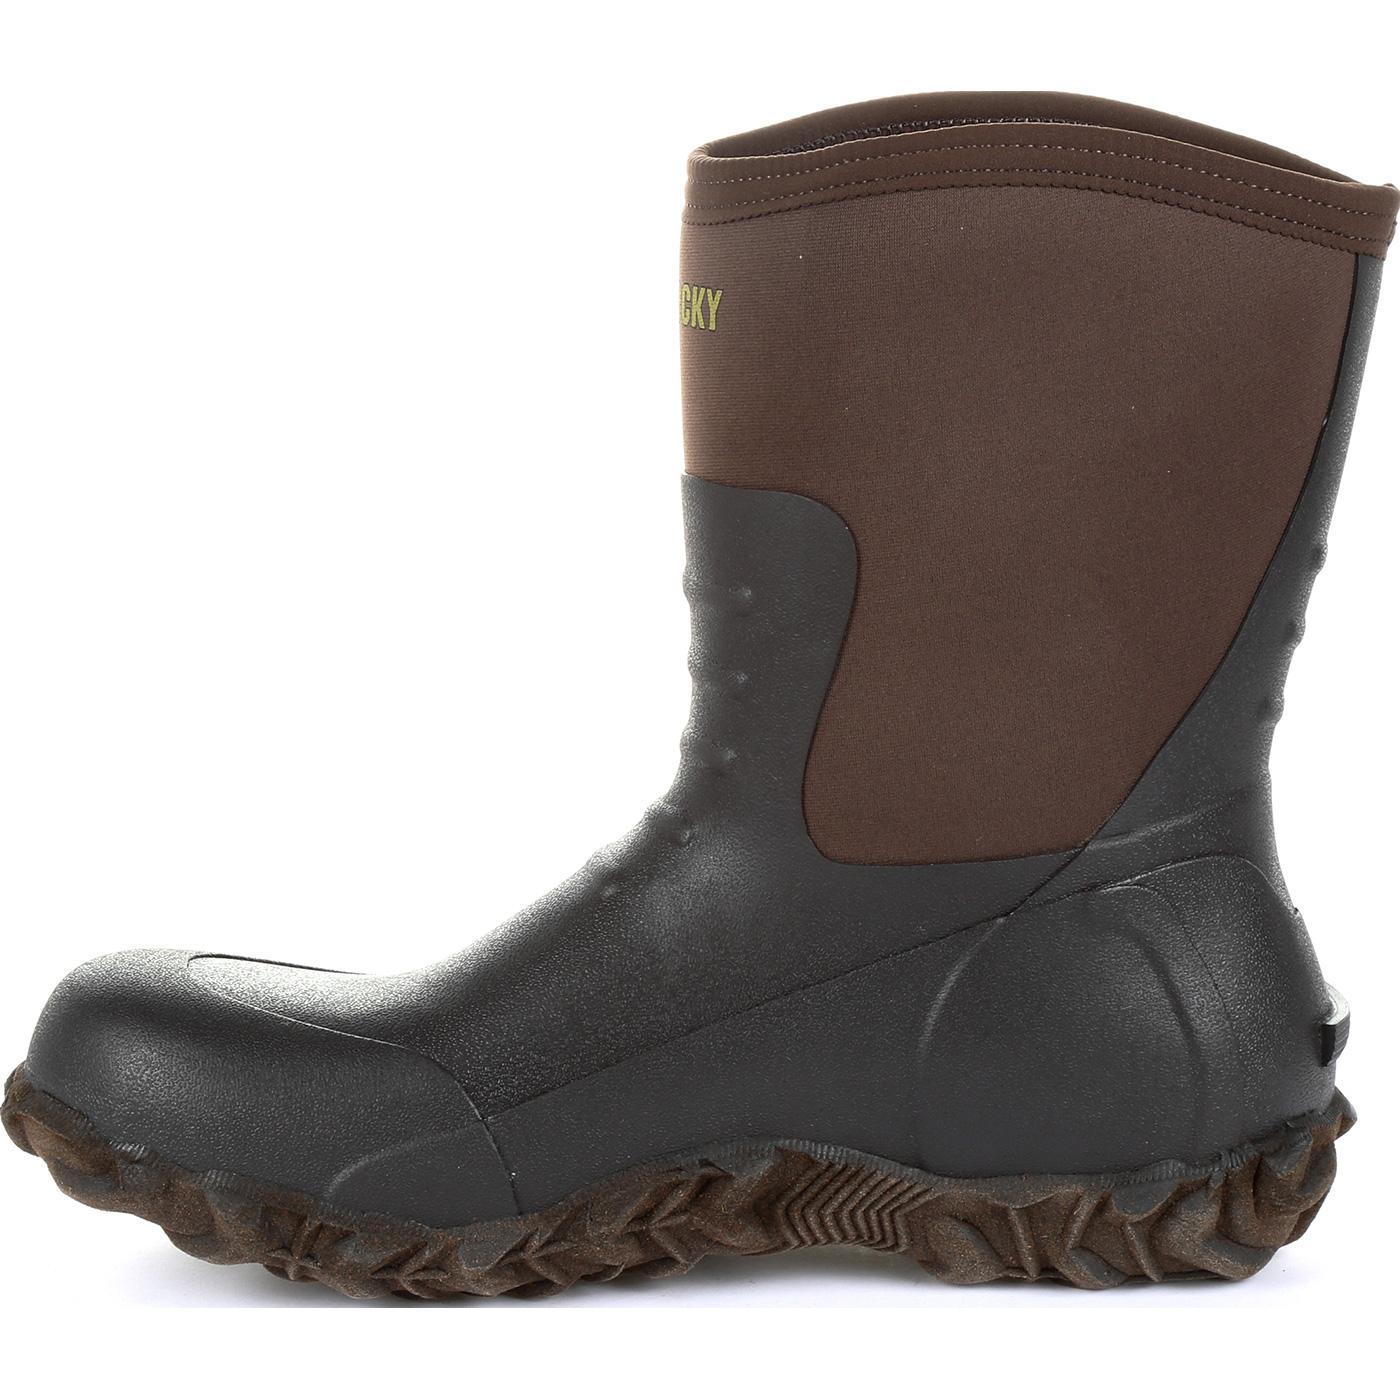 c8e6ce61a63 Rocky Core Chore Brown Rubber Outdoor Boot